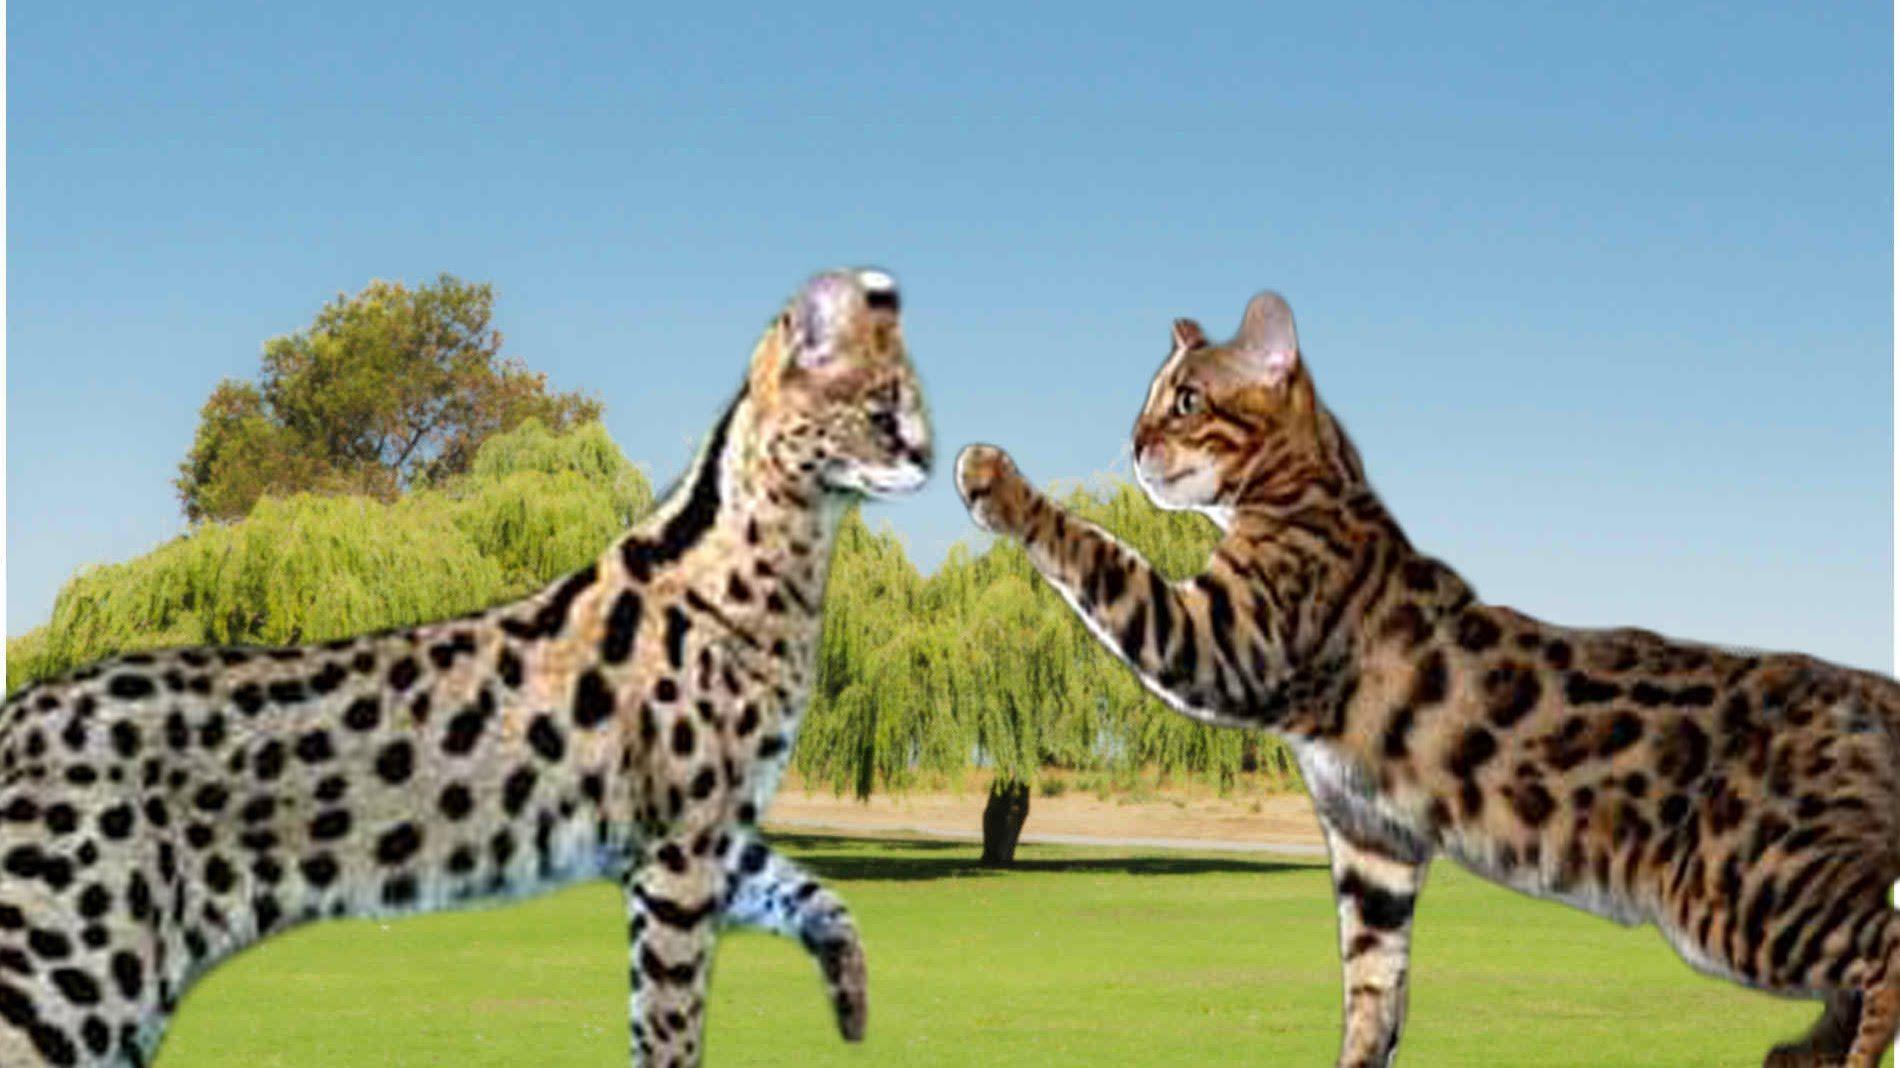 Savannah Cat vs Bengal Cat Understanding The Differences